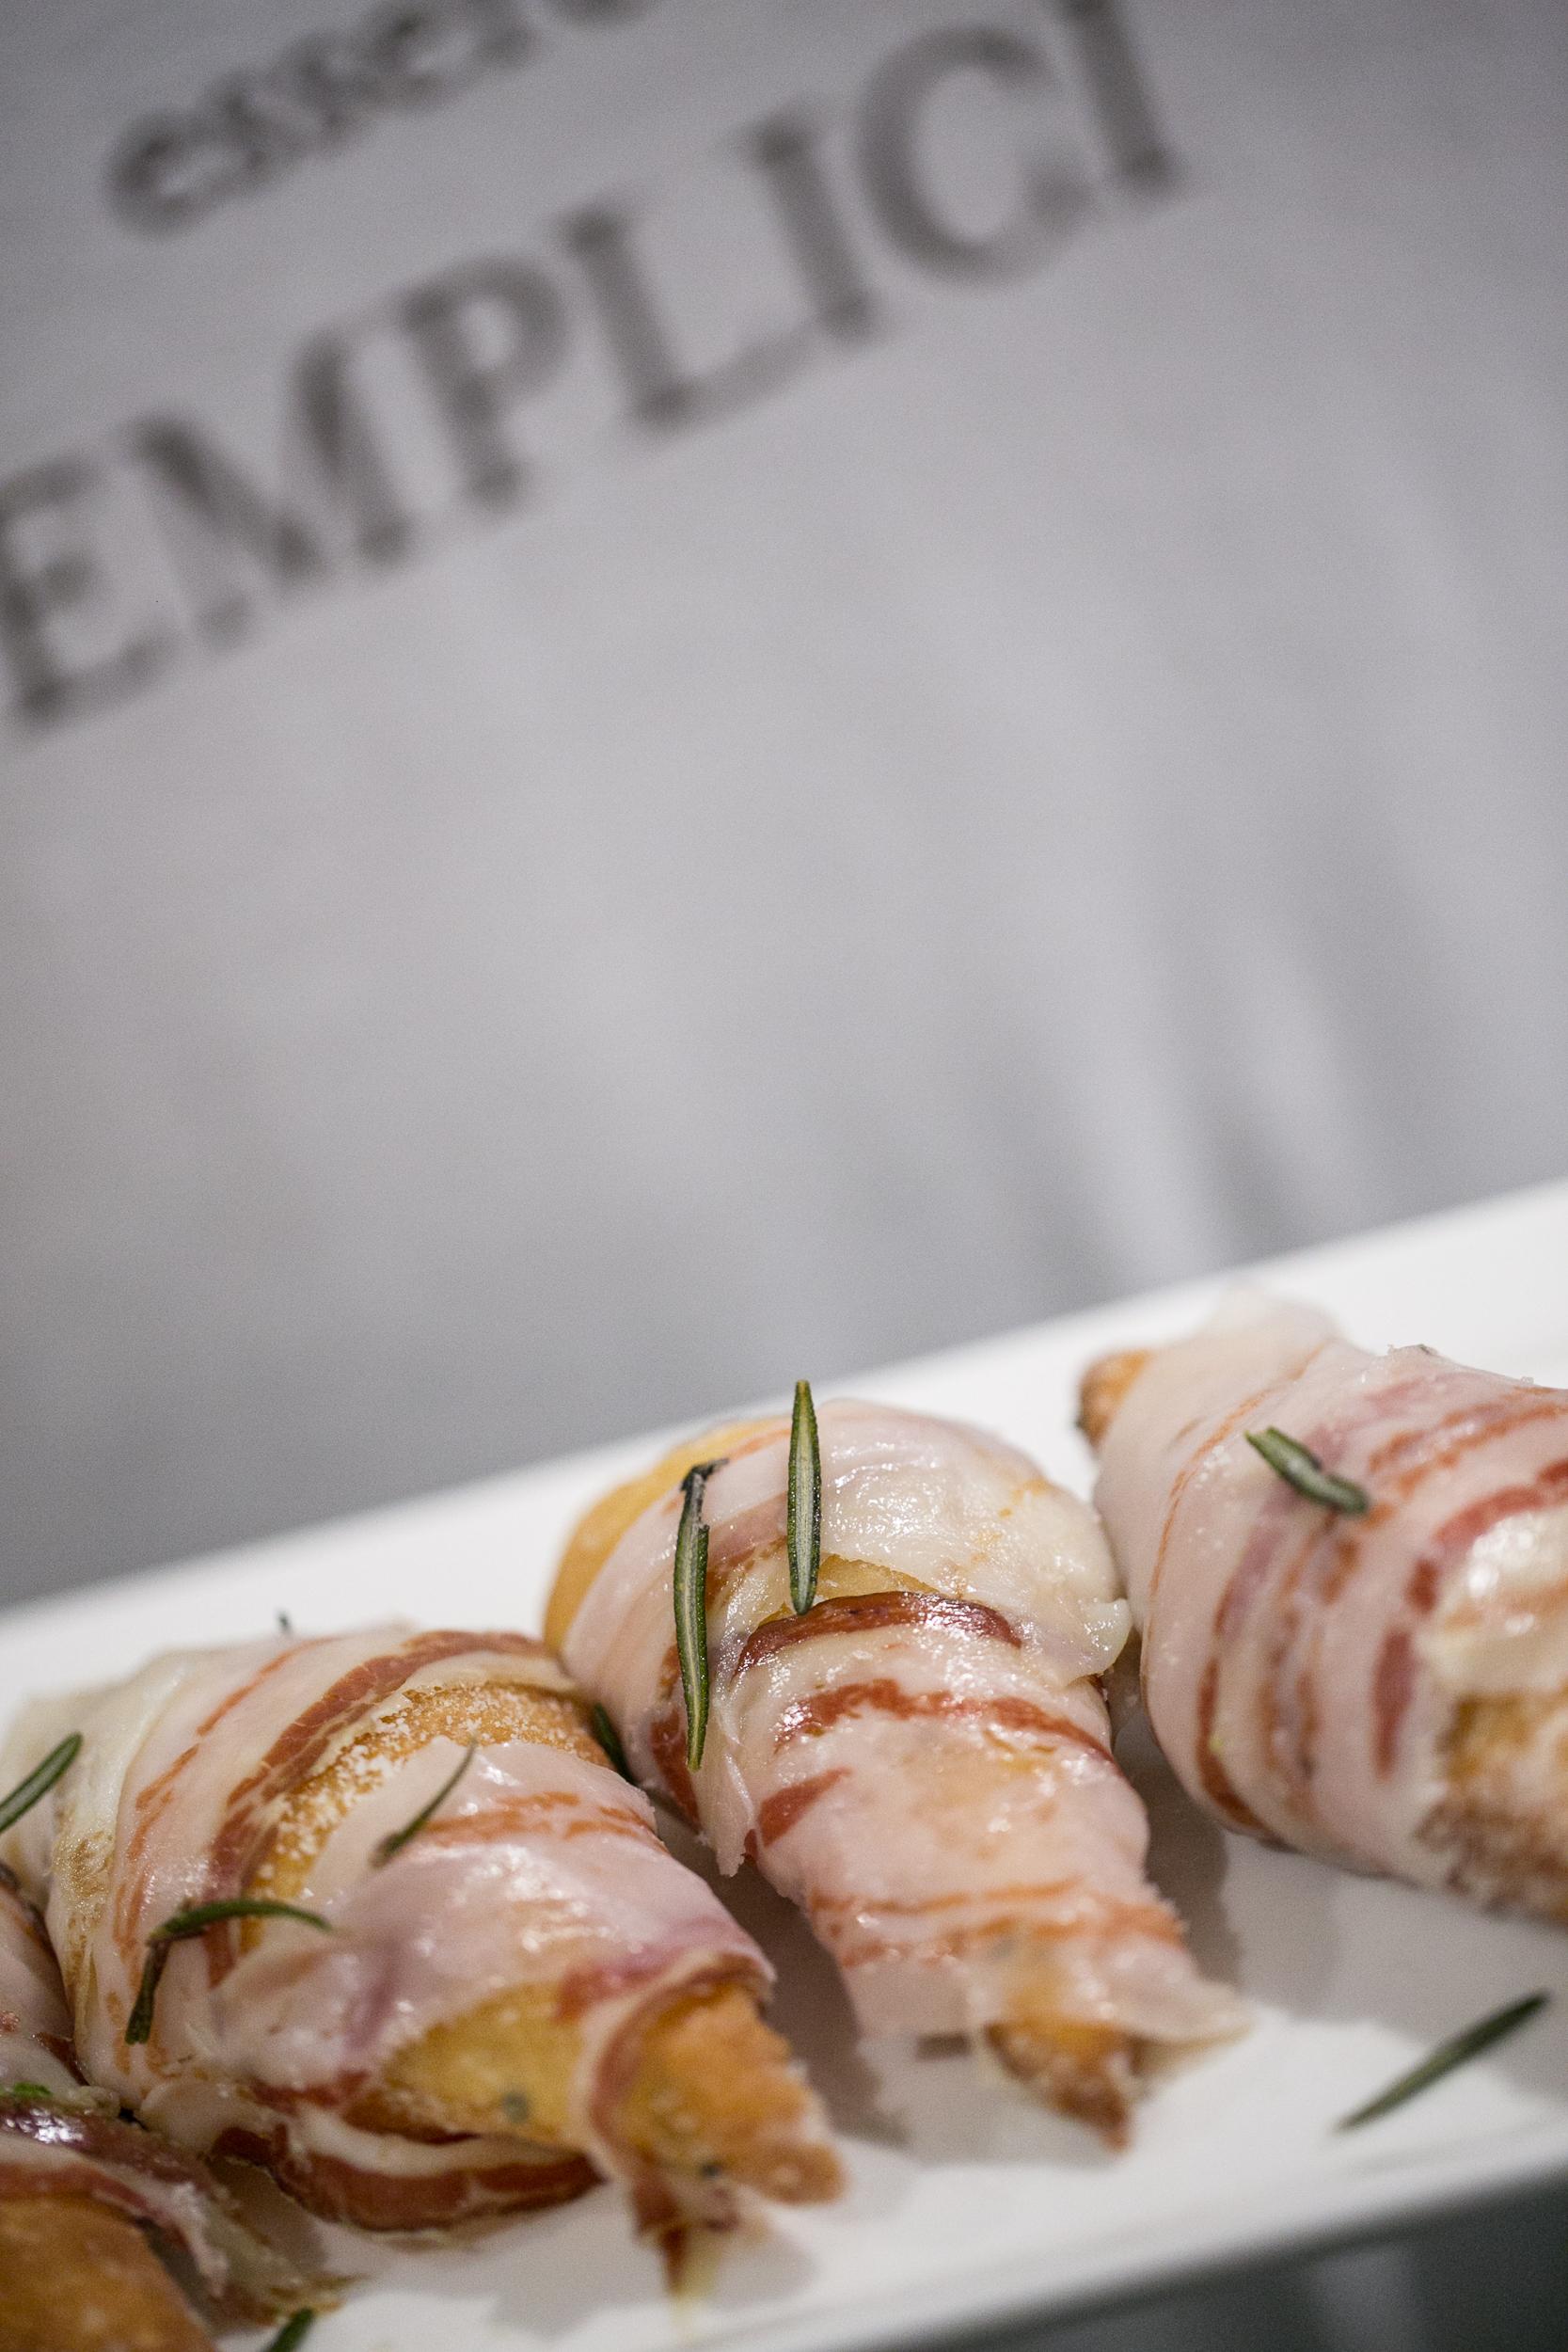 Inspiring Kitchen gnocco with lardo